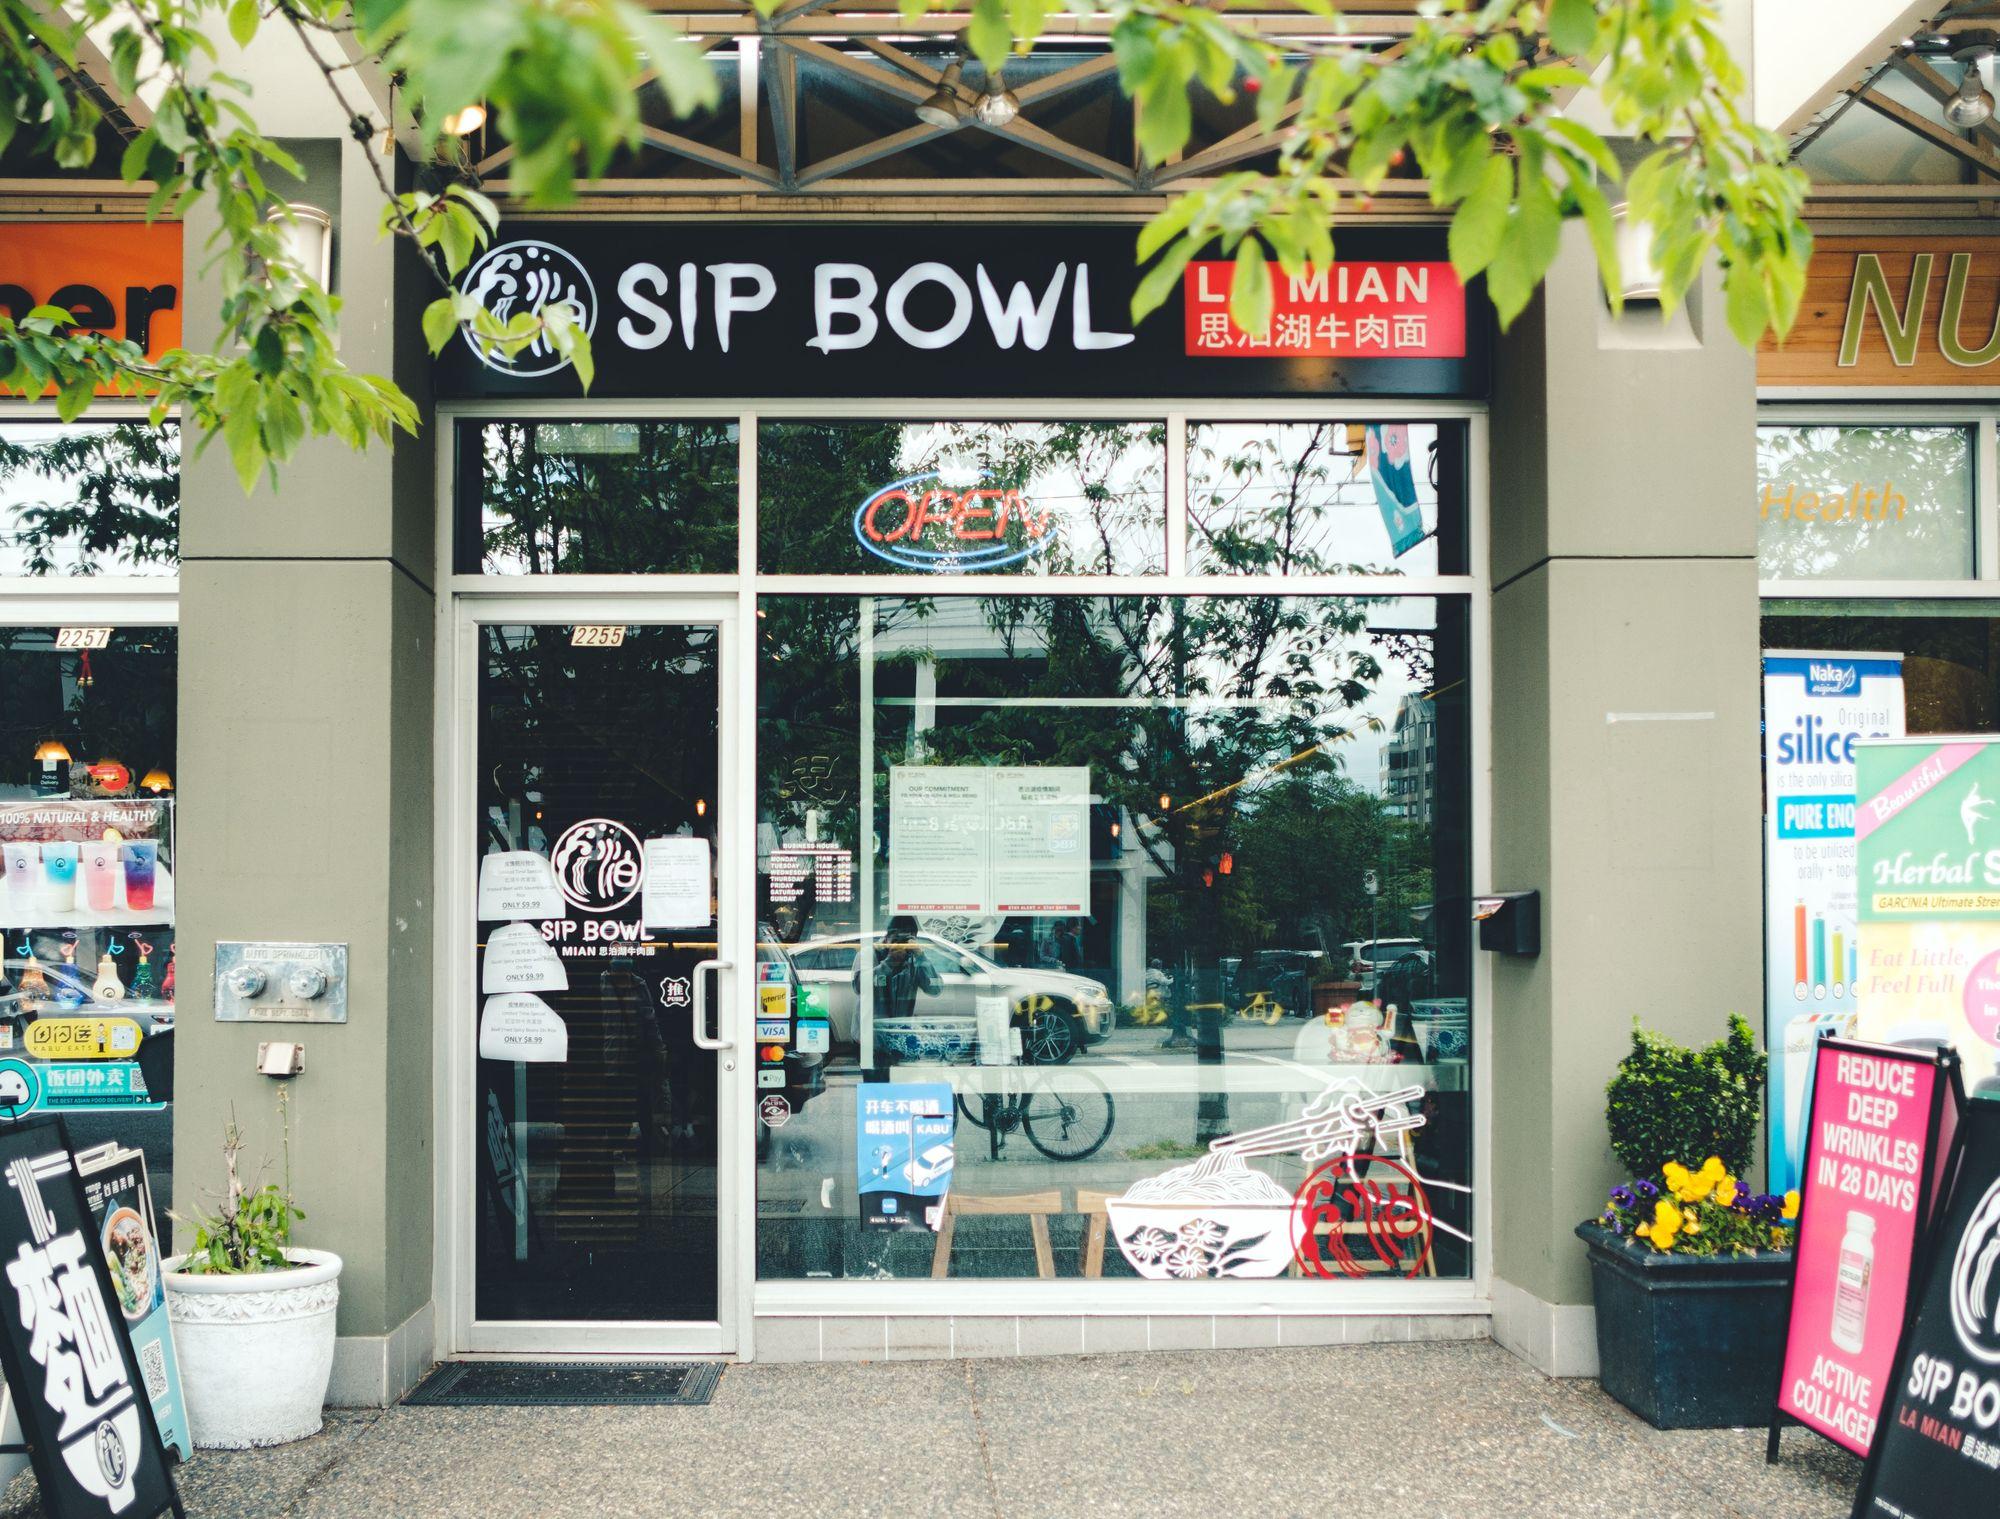 Outside Sip Bowl